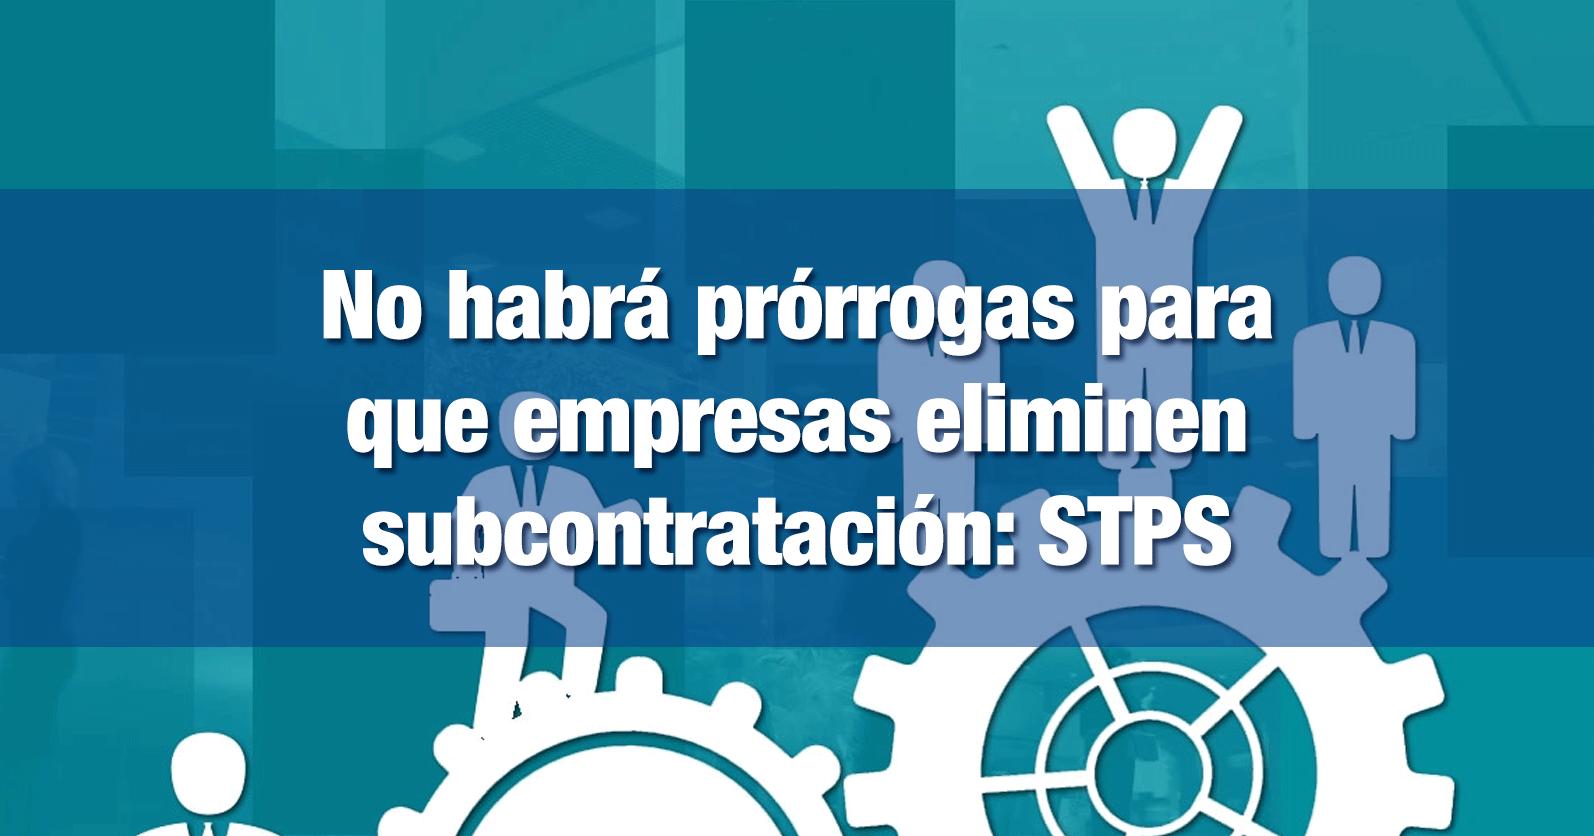 No habrá prórrogas para que empresas eliminen subcontratación: STPS